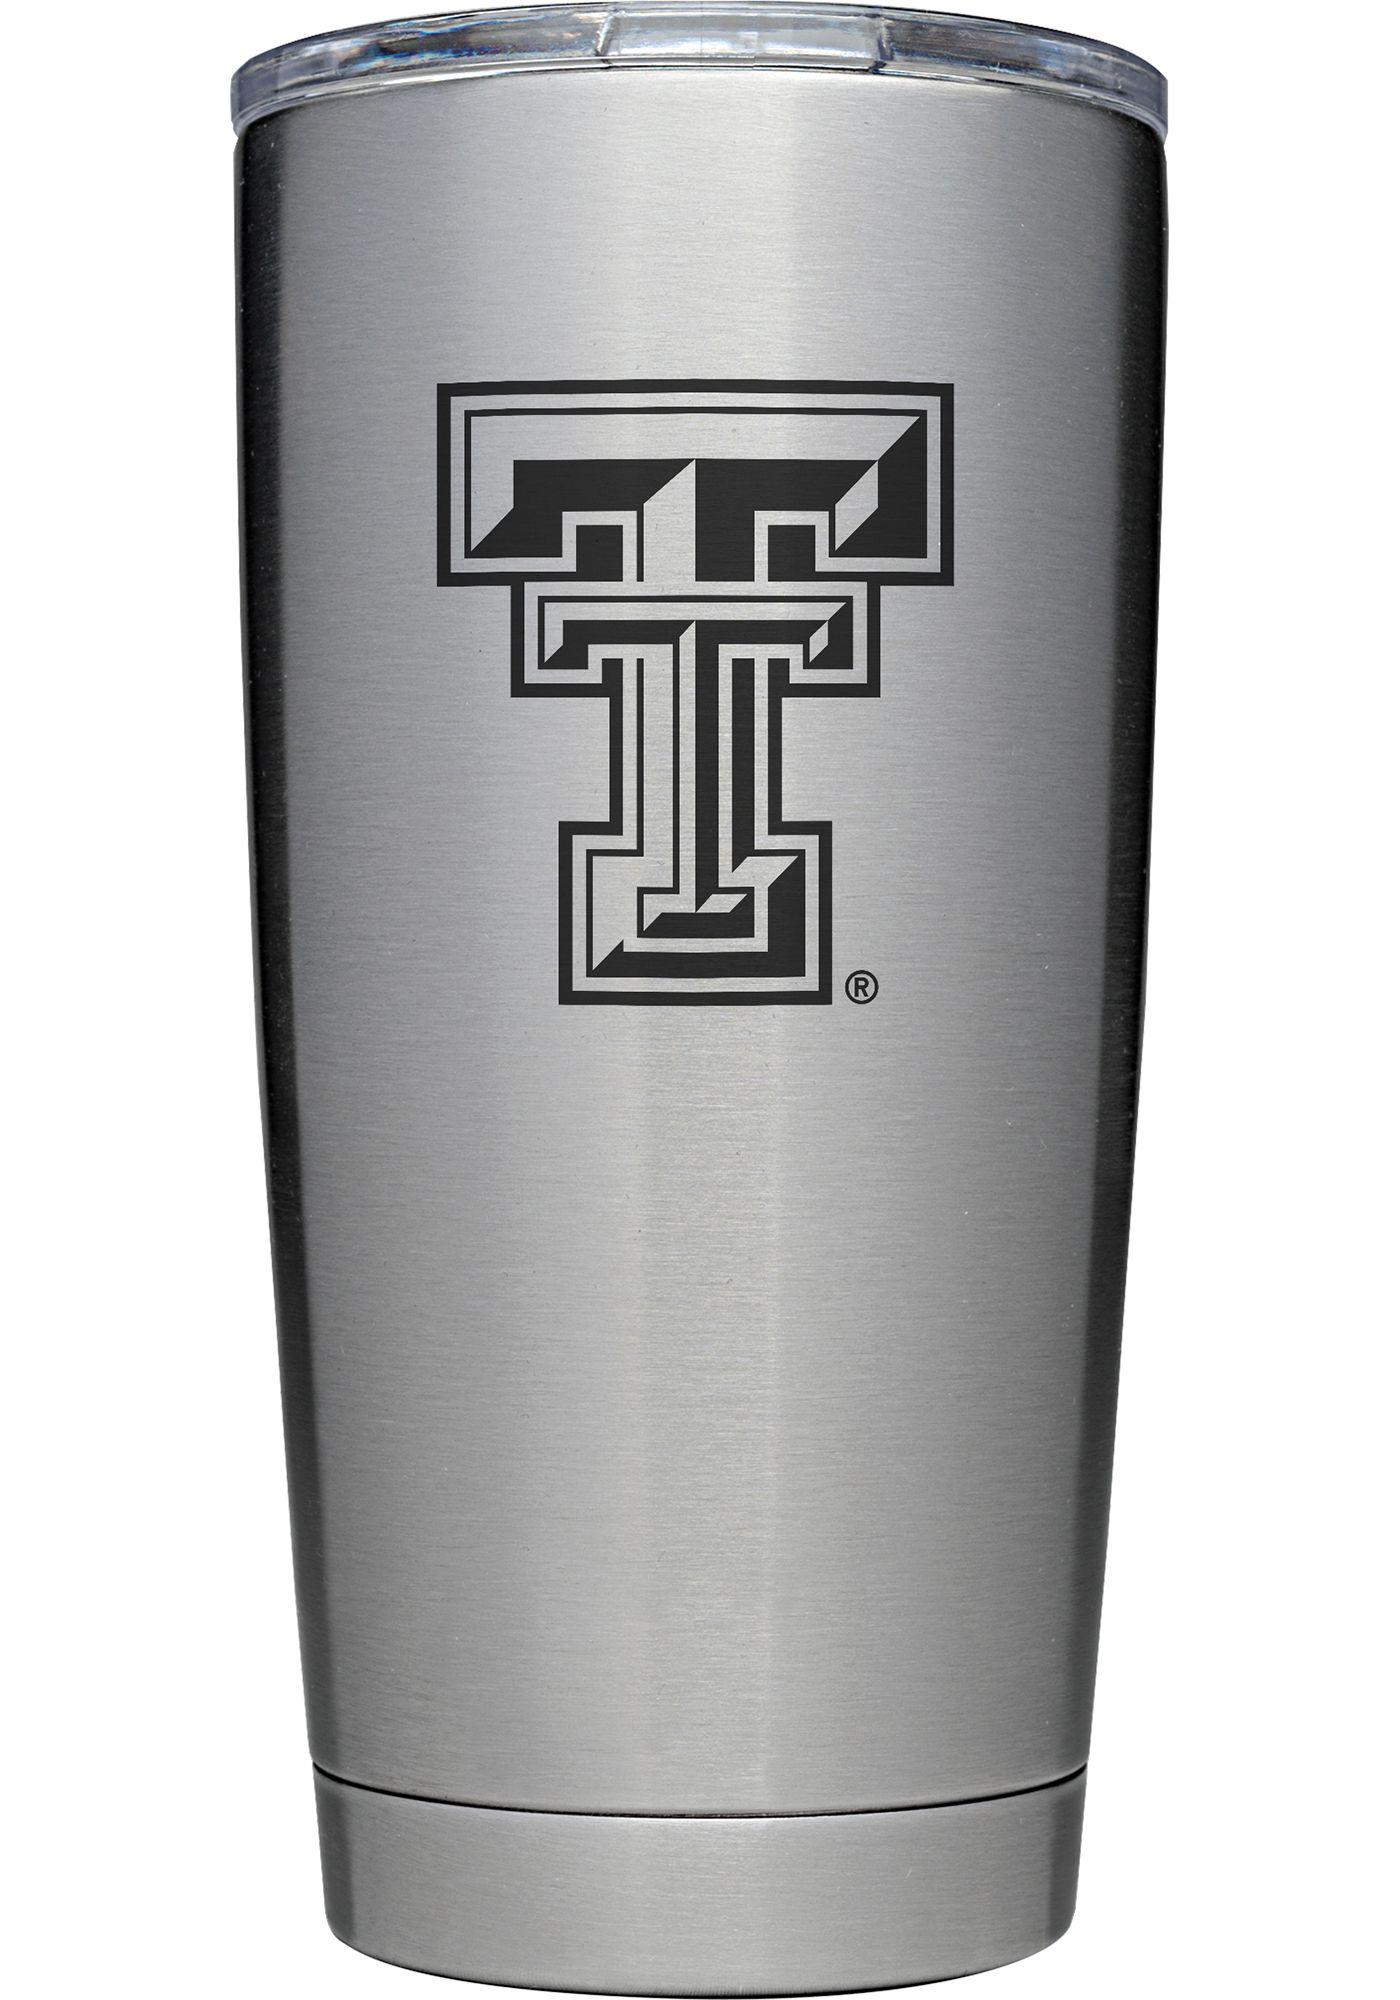 YETI Texas Tech Red Raiders 20 oz. Rambler Tumbler with MagSlider Lid